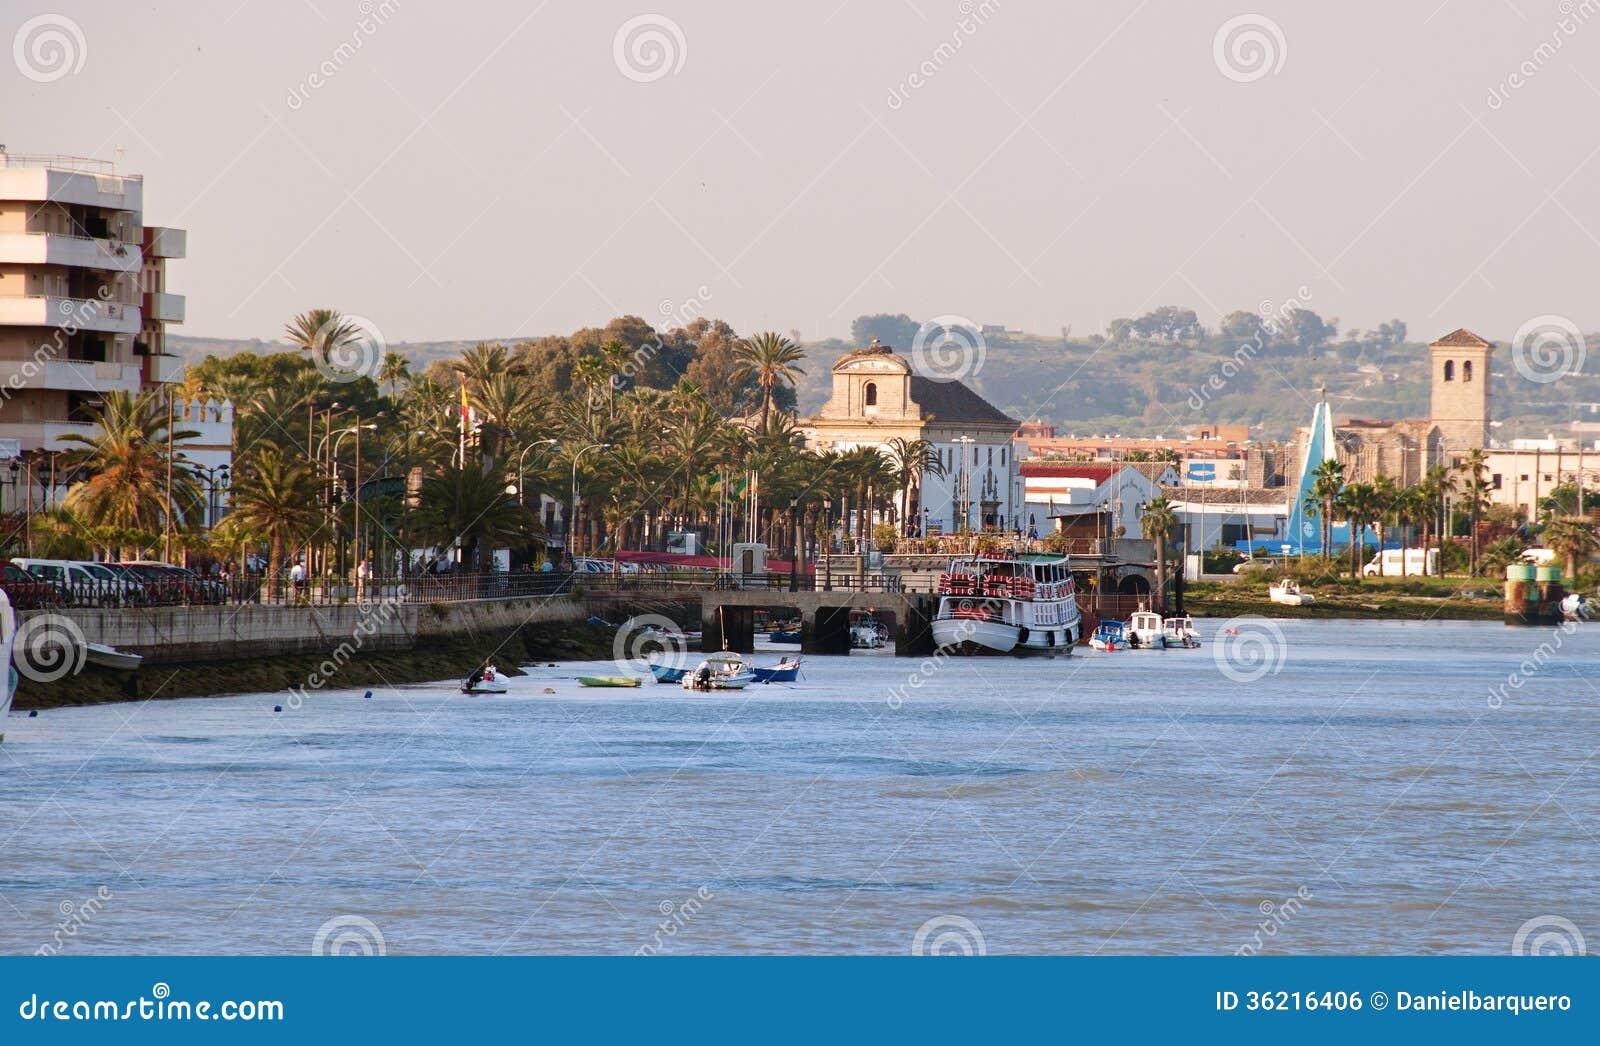 Puerto de santa maria cadiz spain stock photo image of dock south 36216406 - Puerto santa maria cadiz ...